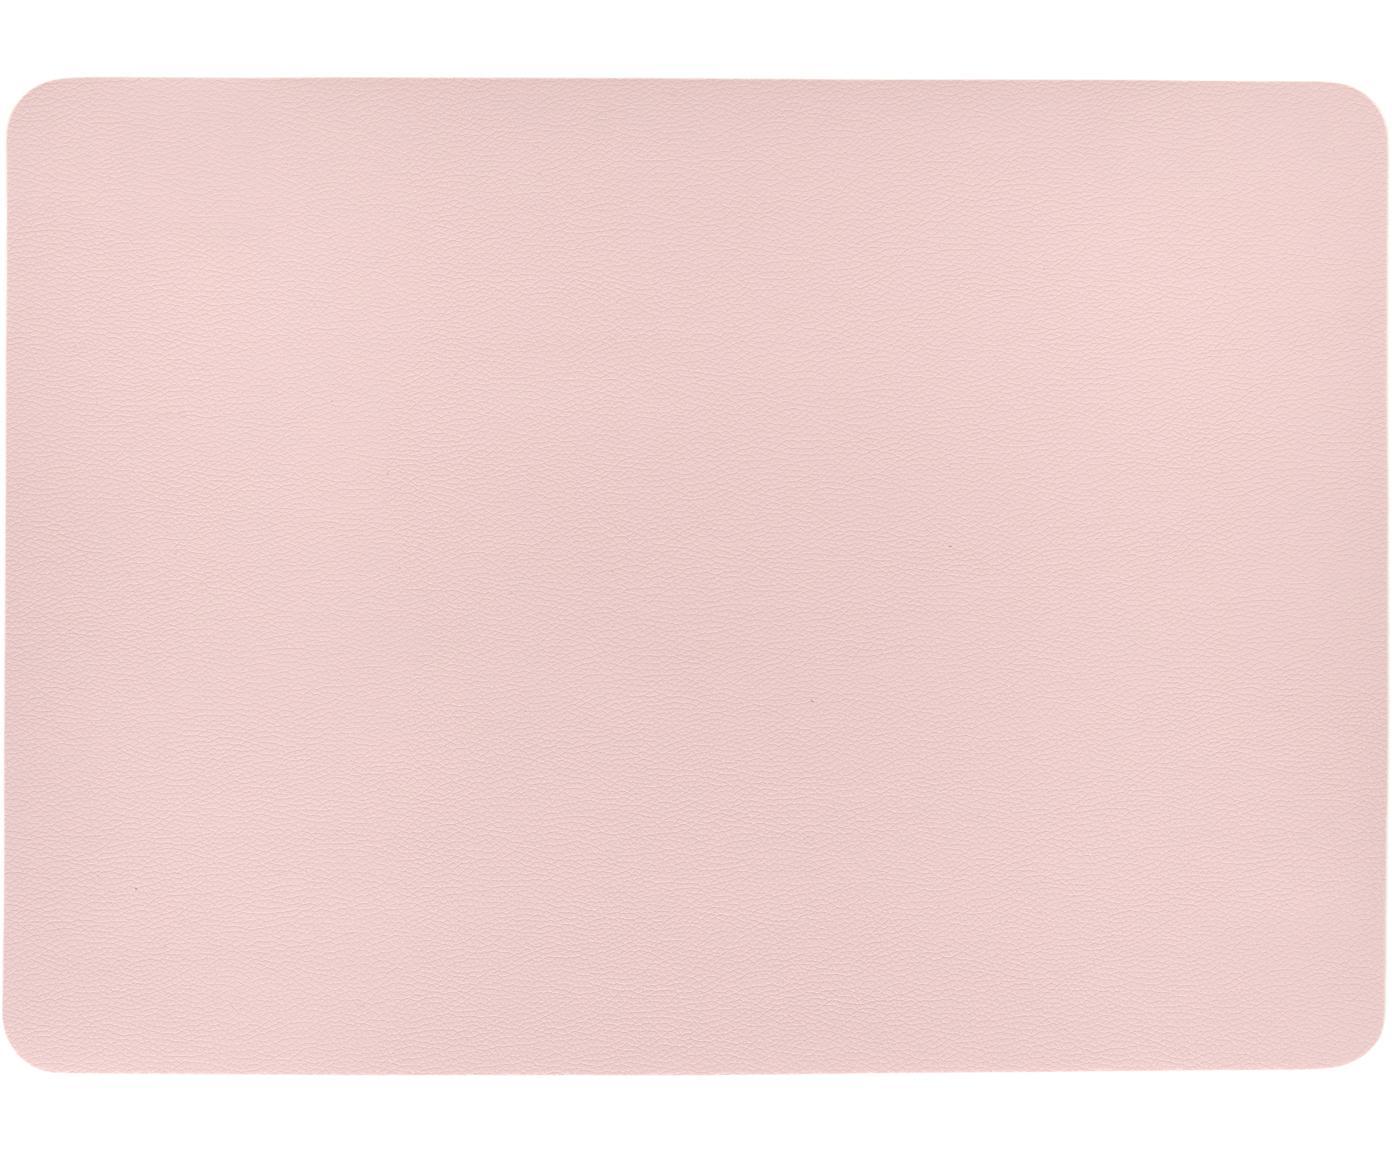 Kunstleder-Tischsets Pik, 2 Stück, Kunstleder (PVC), Rosa, 33 x 46 cm